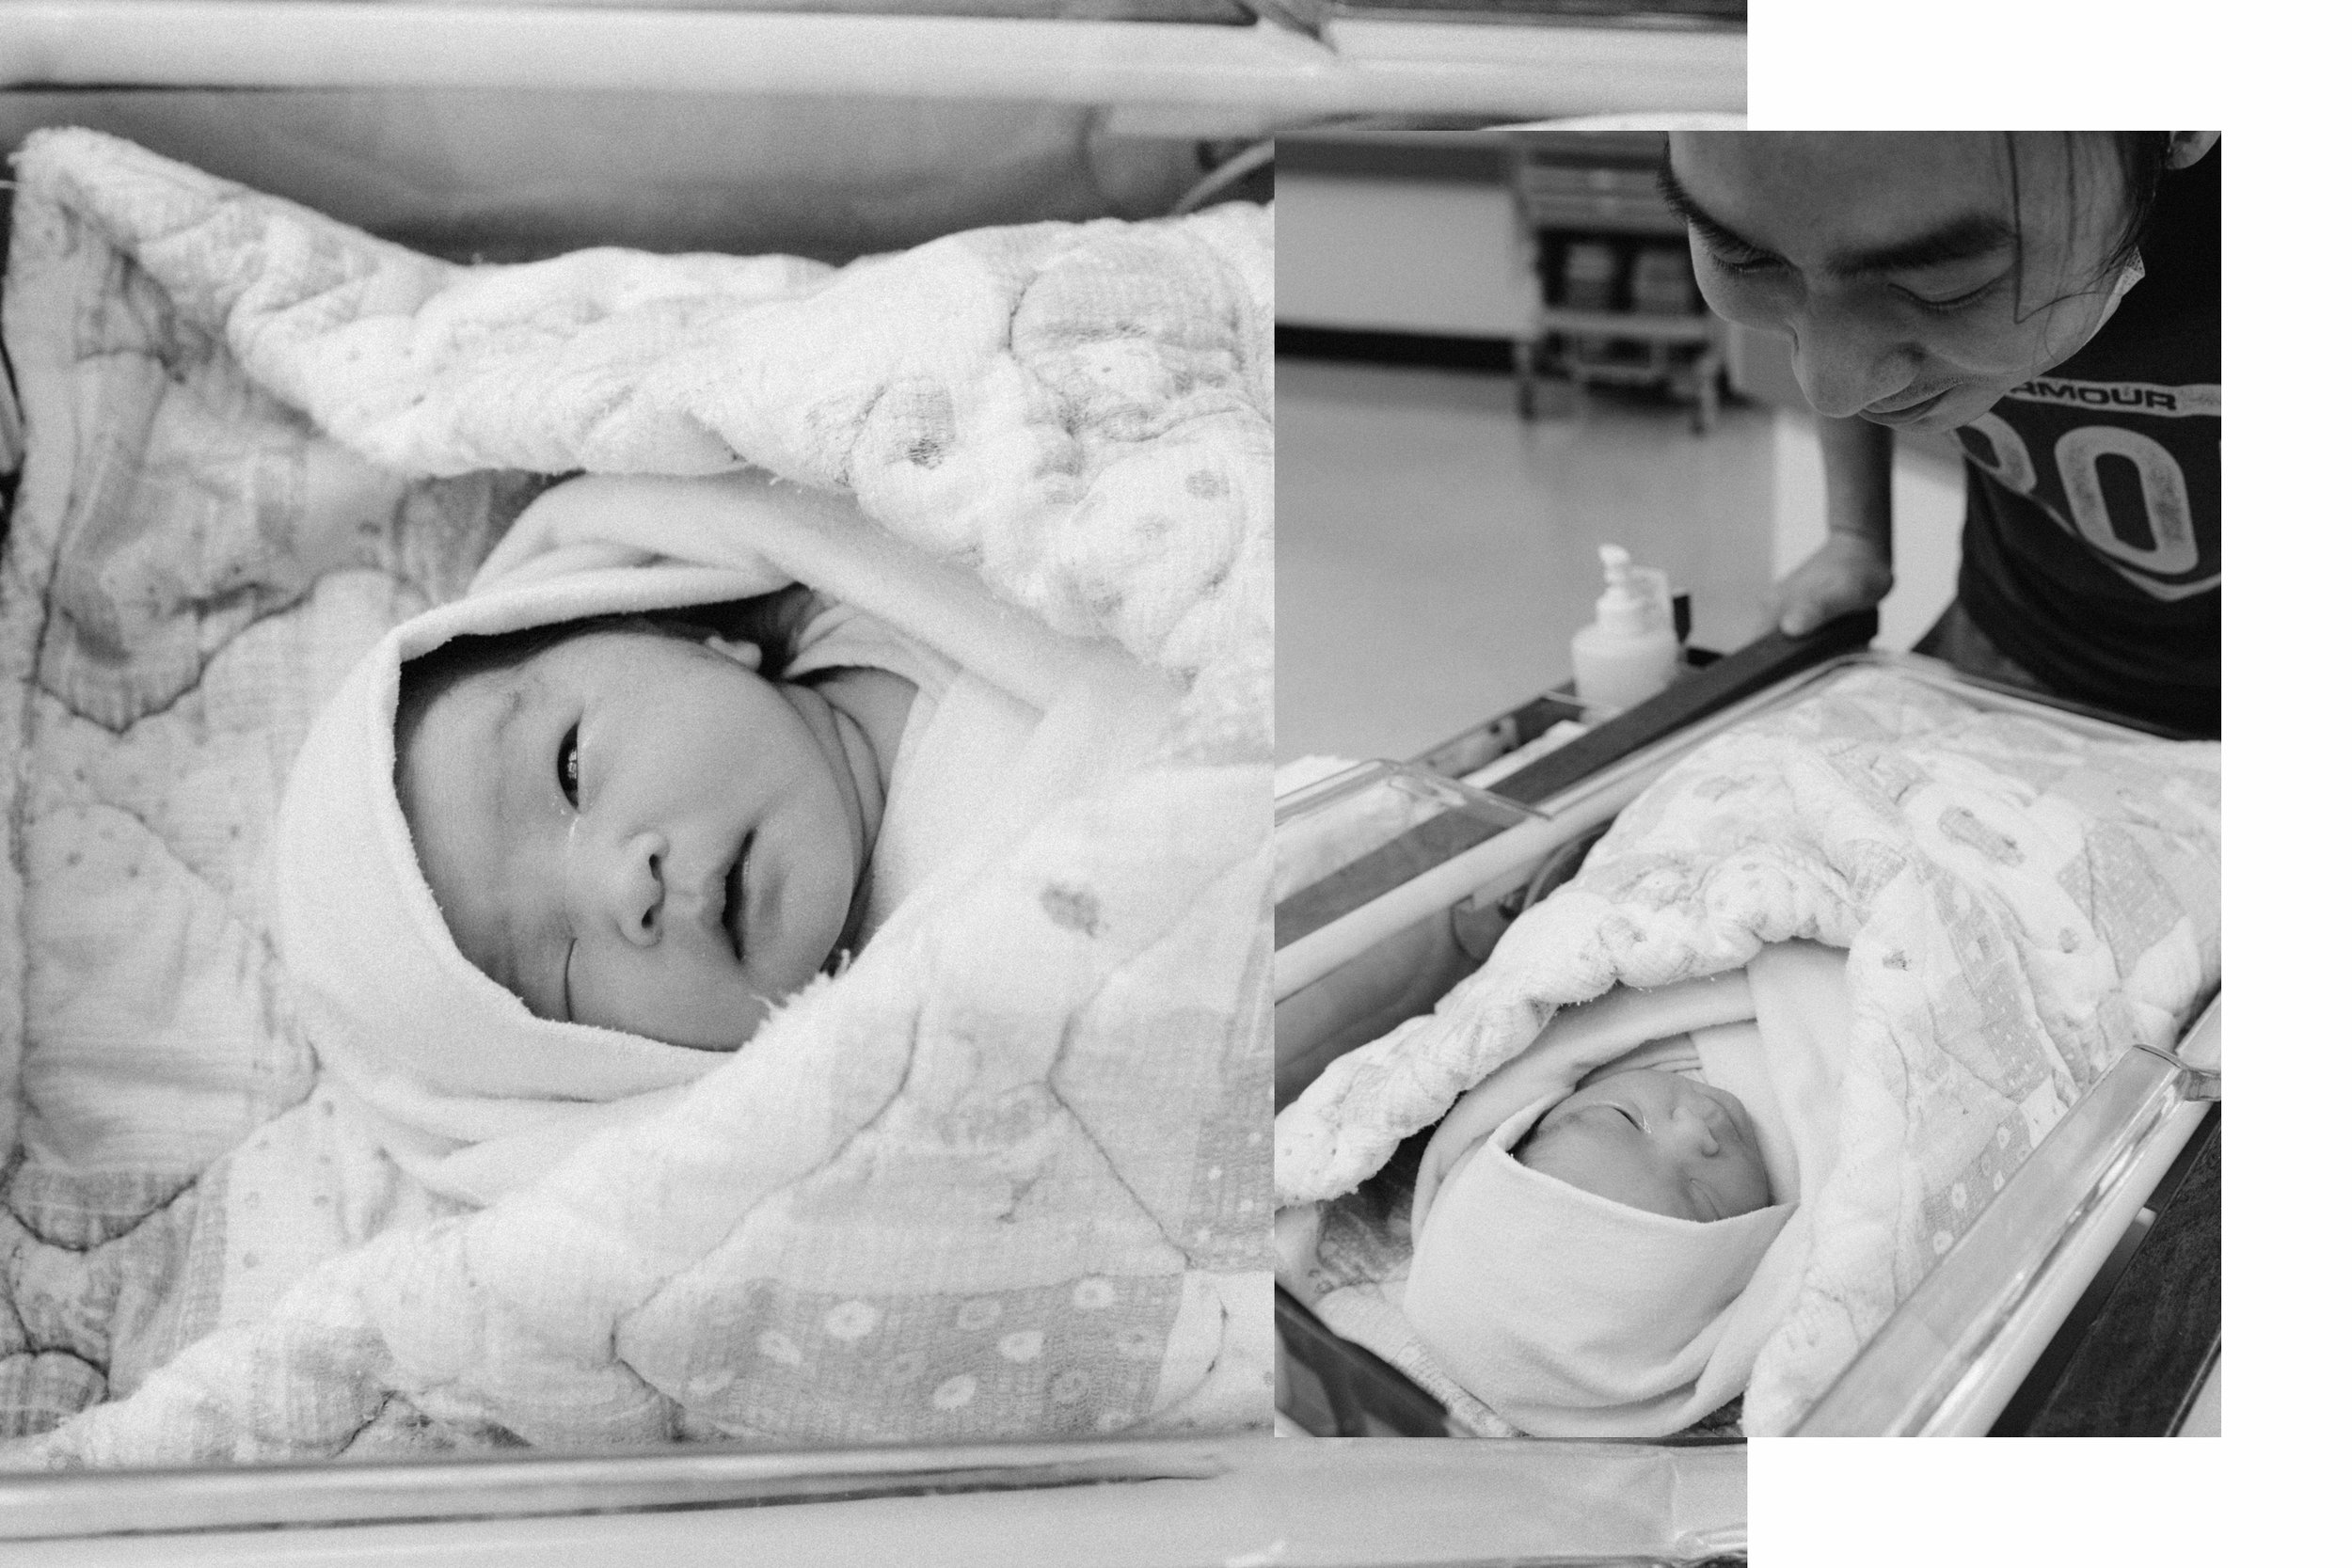 star-ken-firstday-newborn-baby-taipei-台北榮總-37.jpg